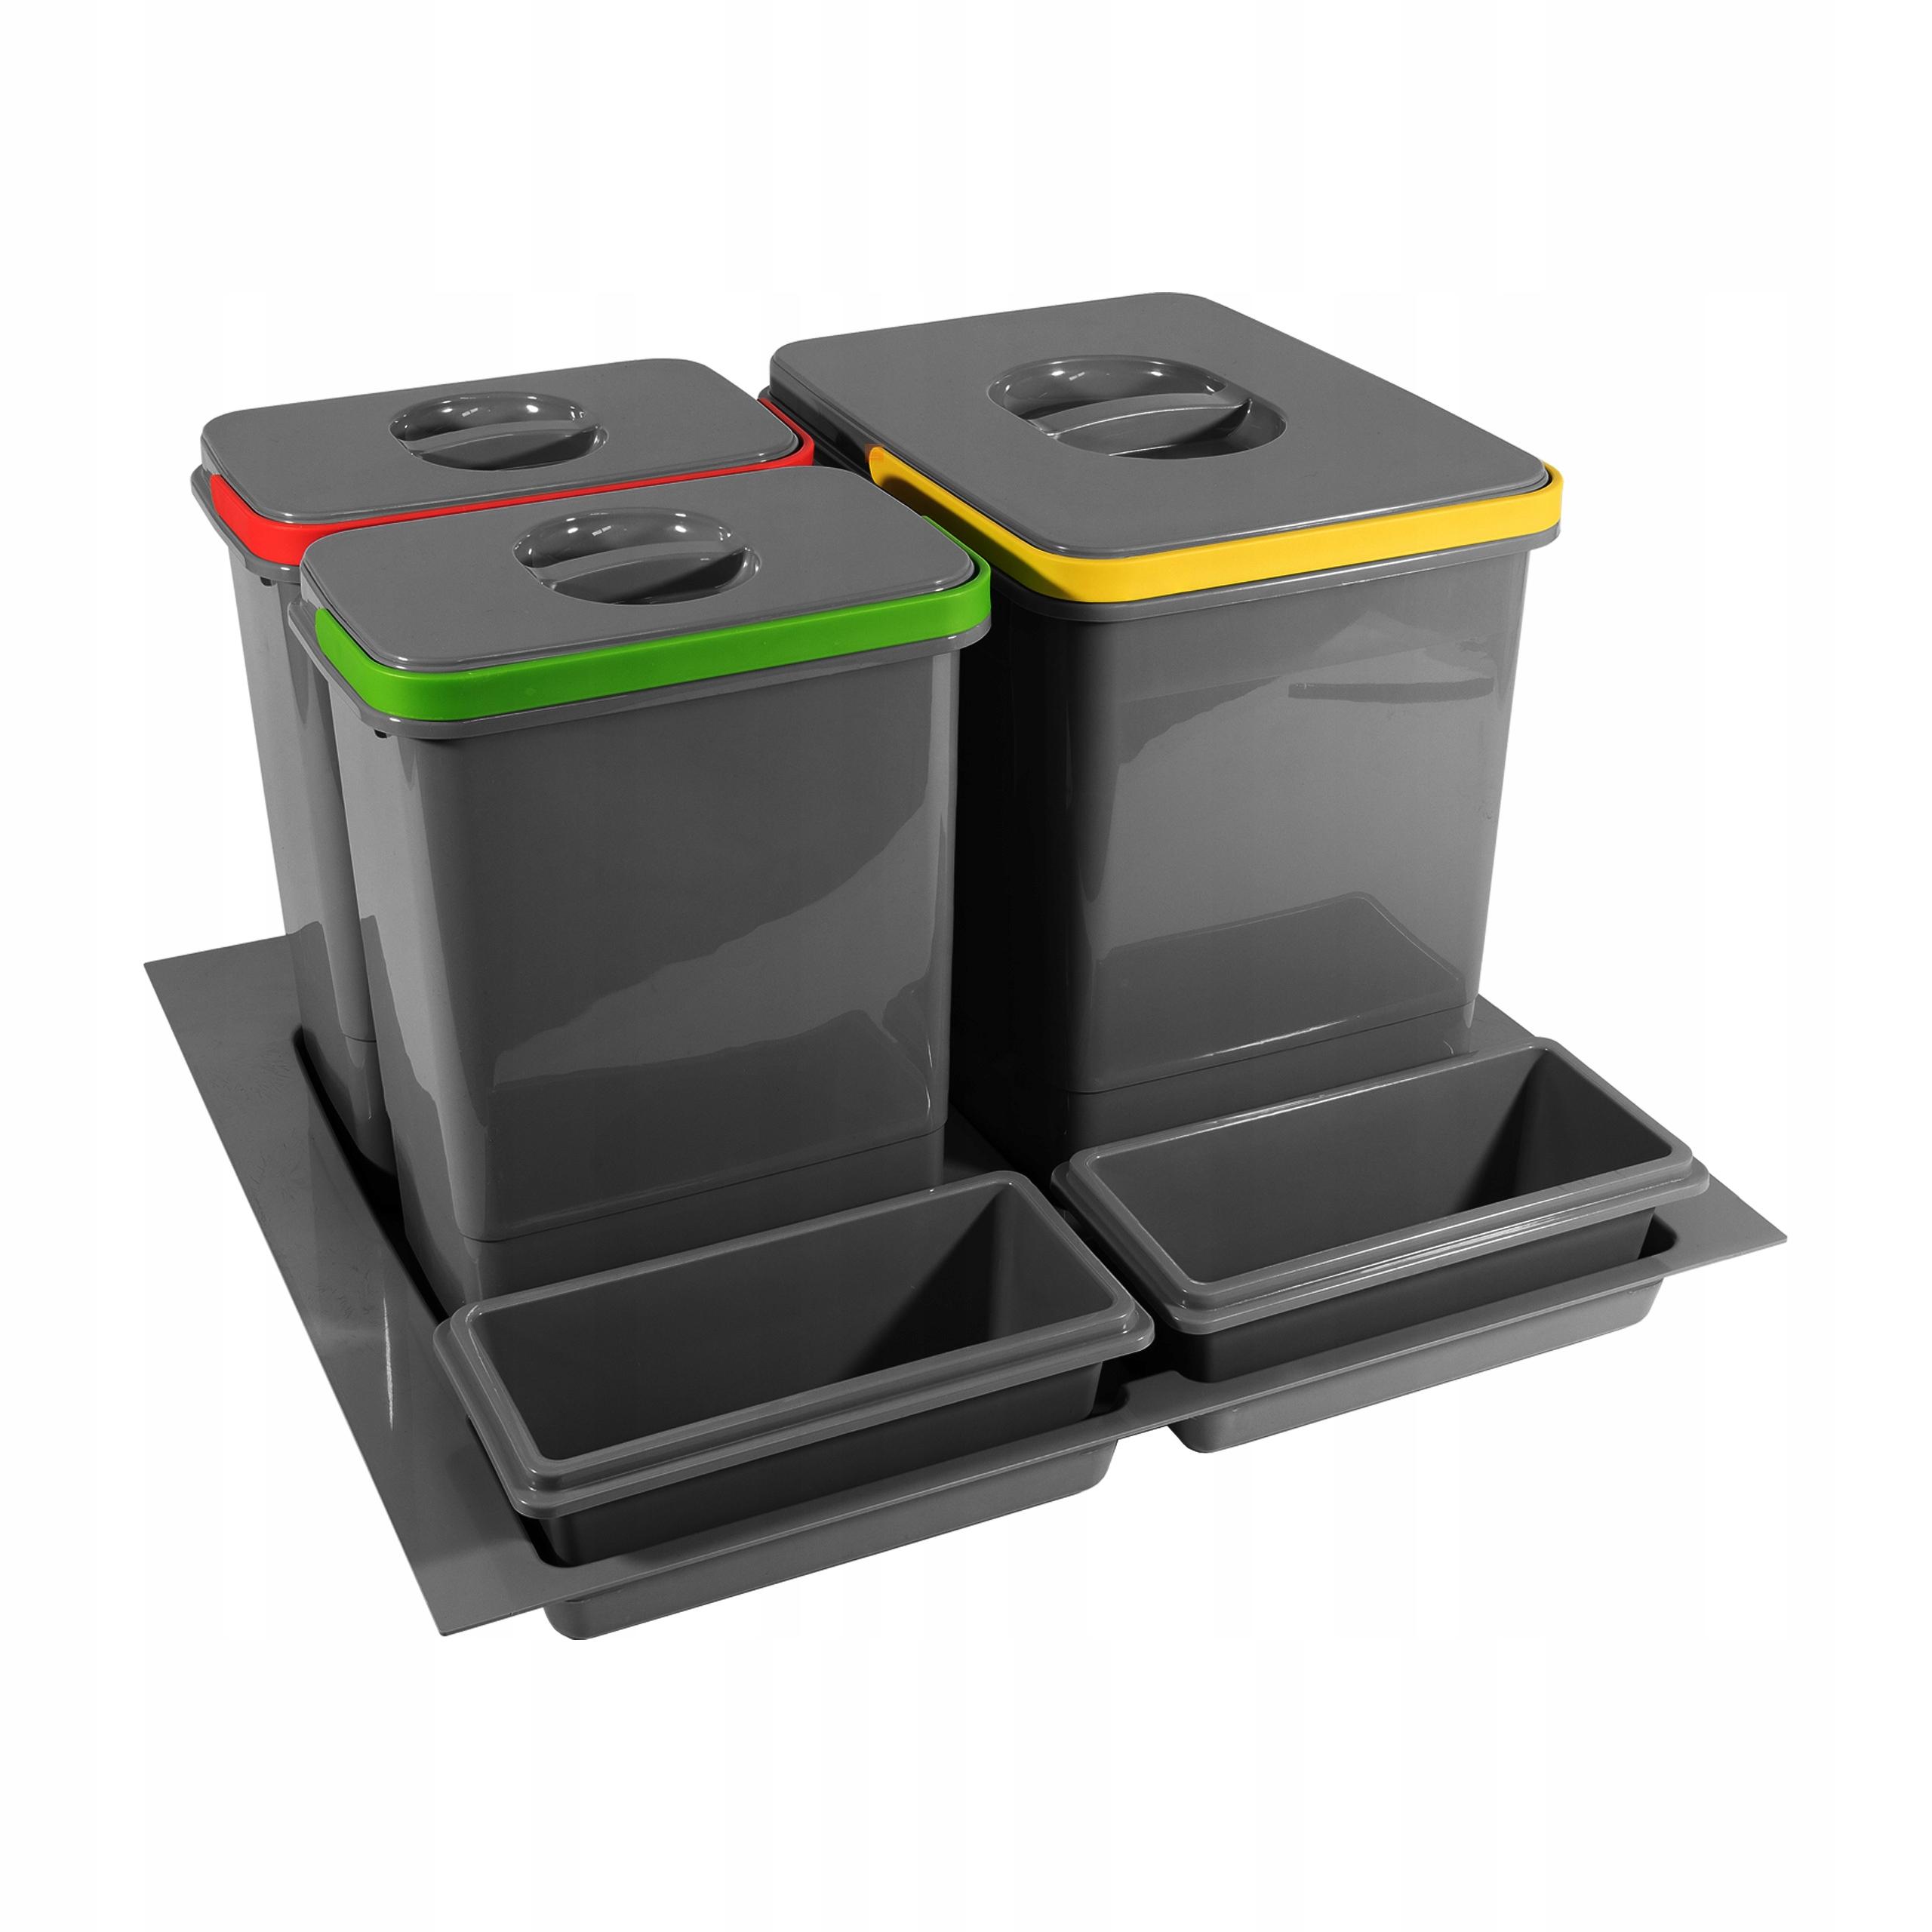 Папка для мусора 60 1x15L, 2x7 L MULTINO